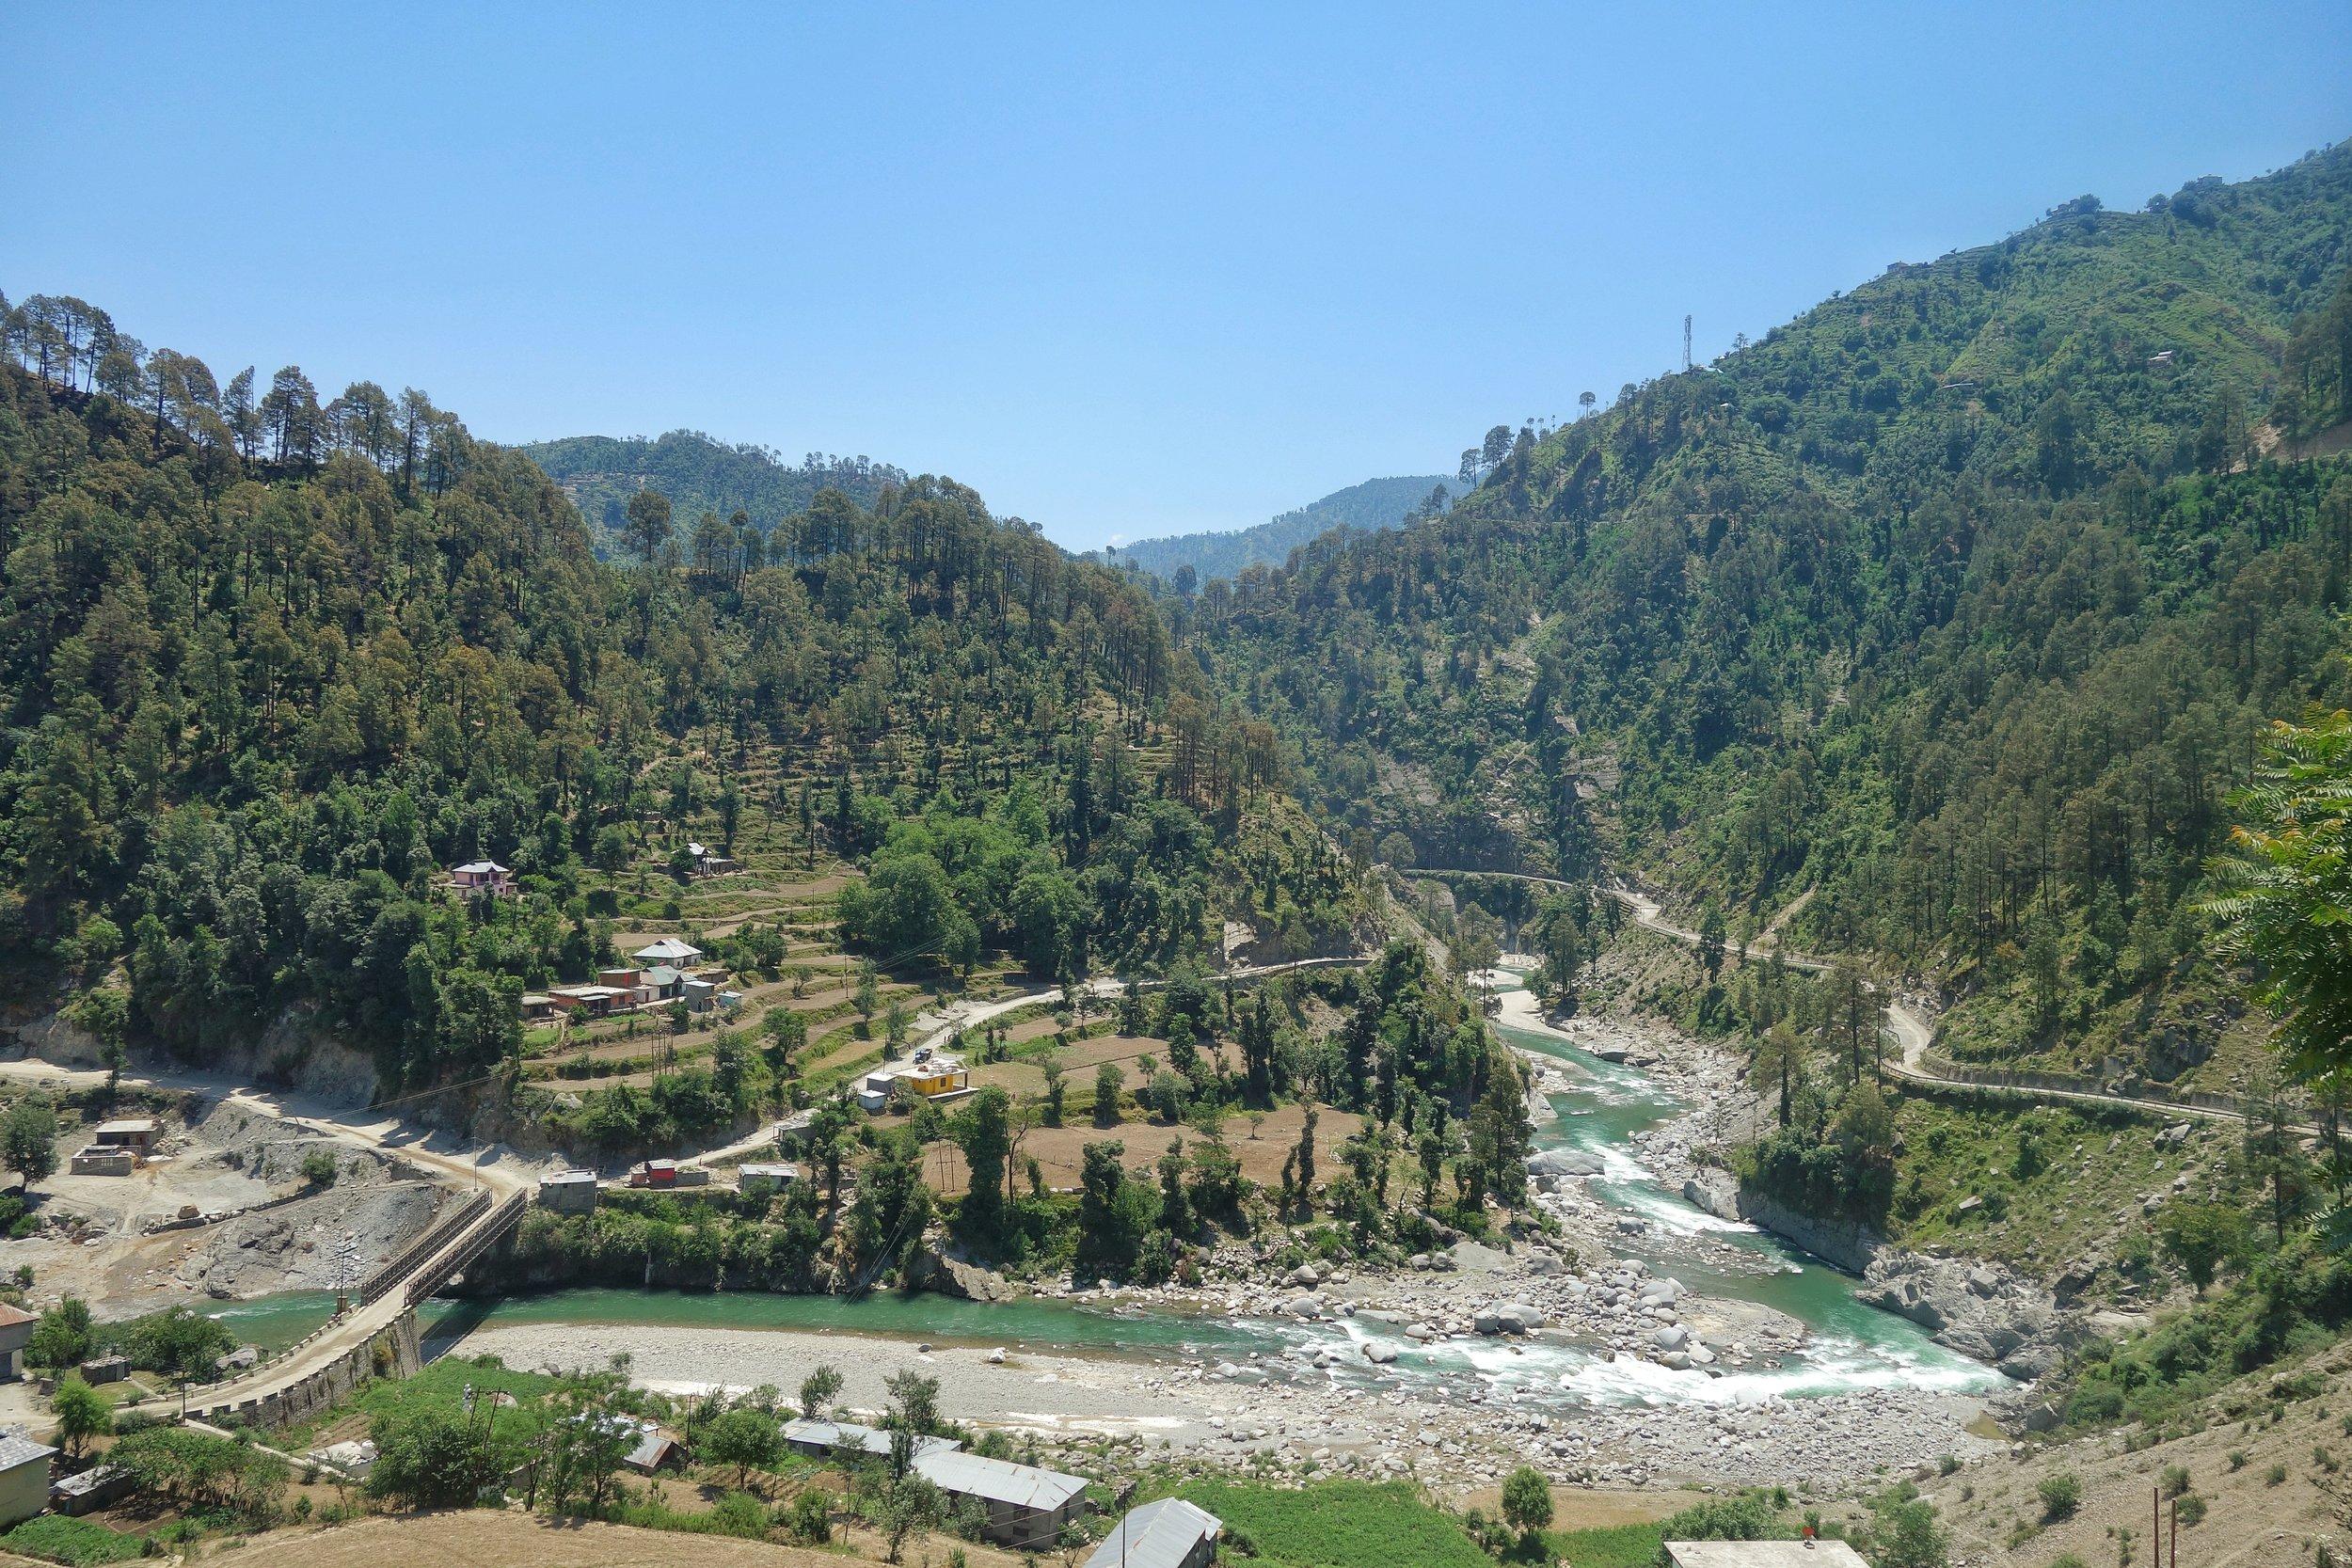 The Sewa River as it flows through Bani